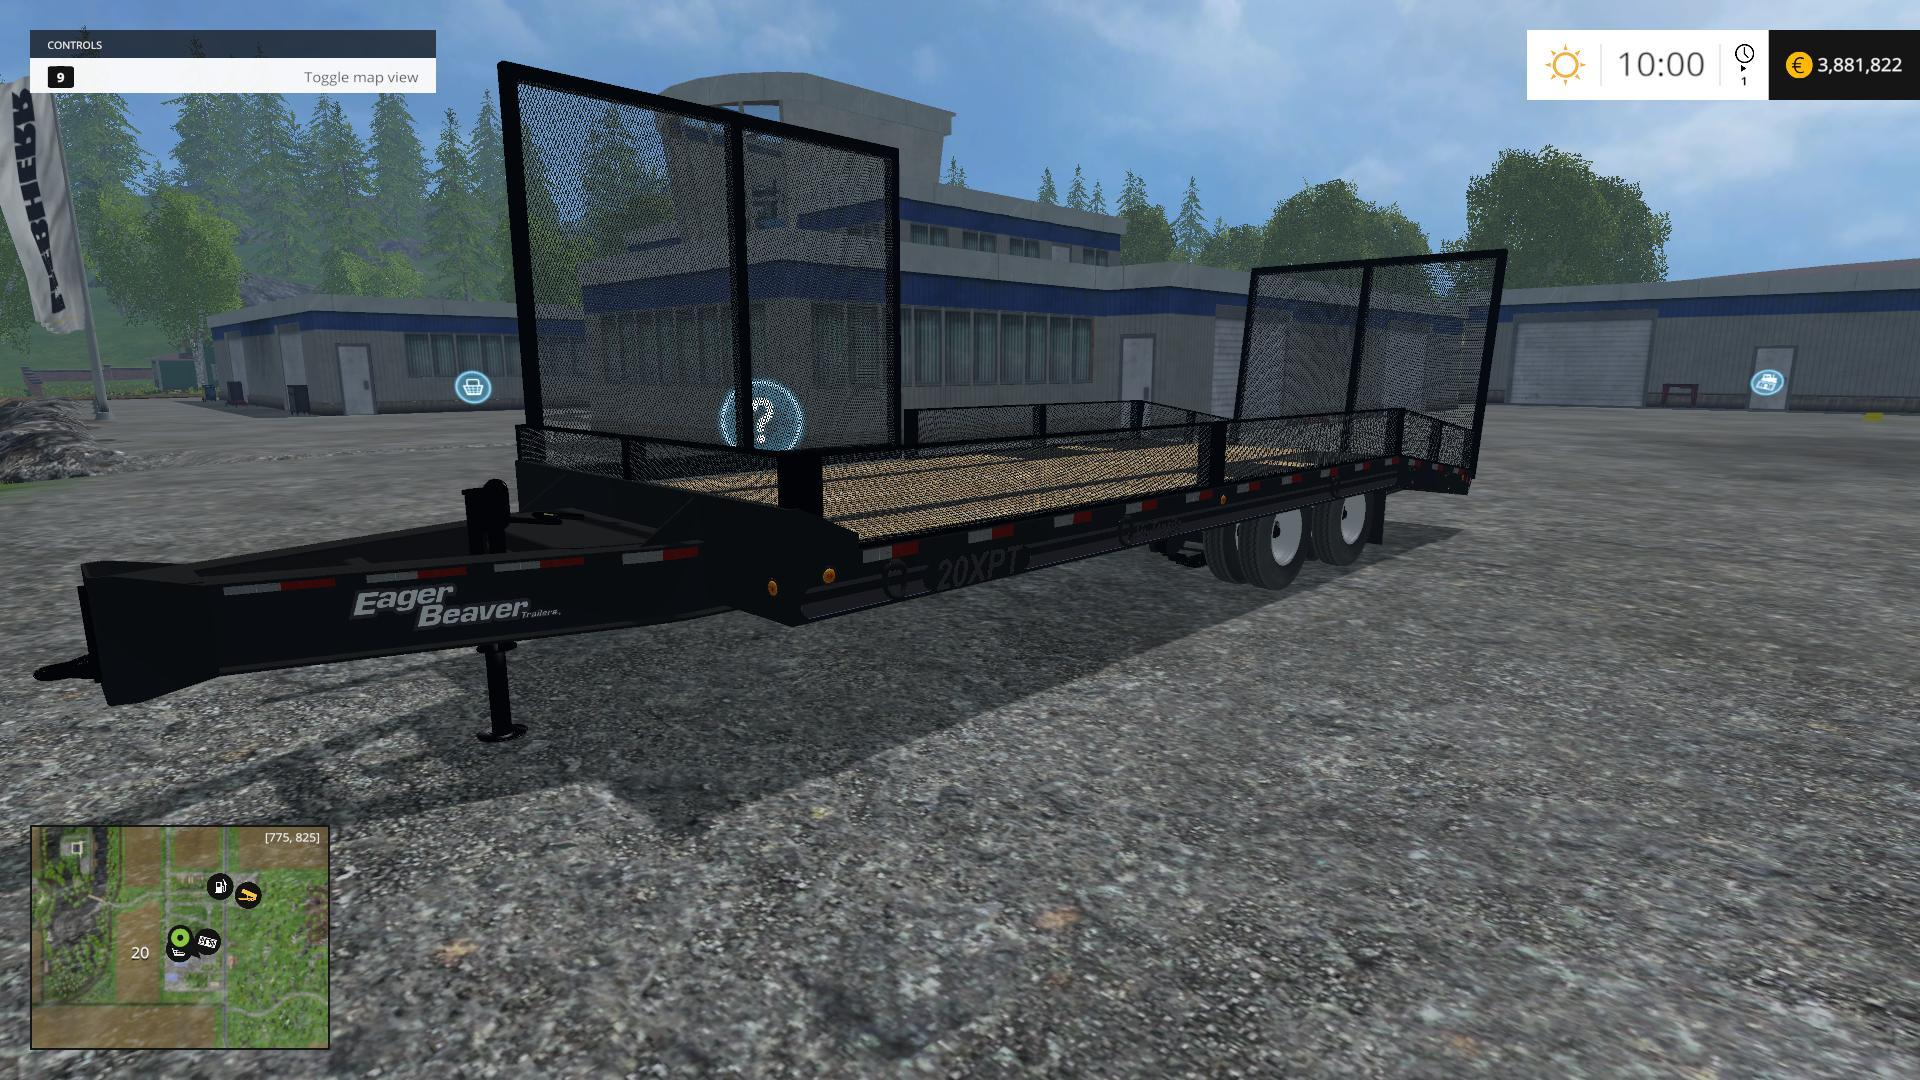 ... V1.0 TRAILER - Farming simulator 2017 / 2015 | 15 / 17 LS mod